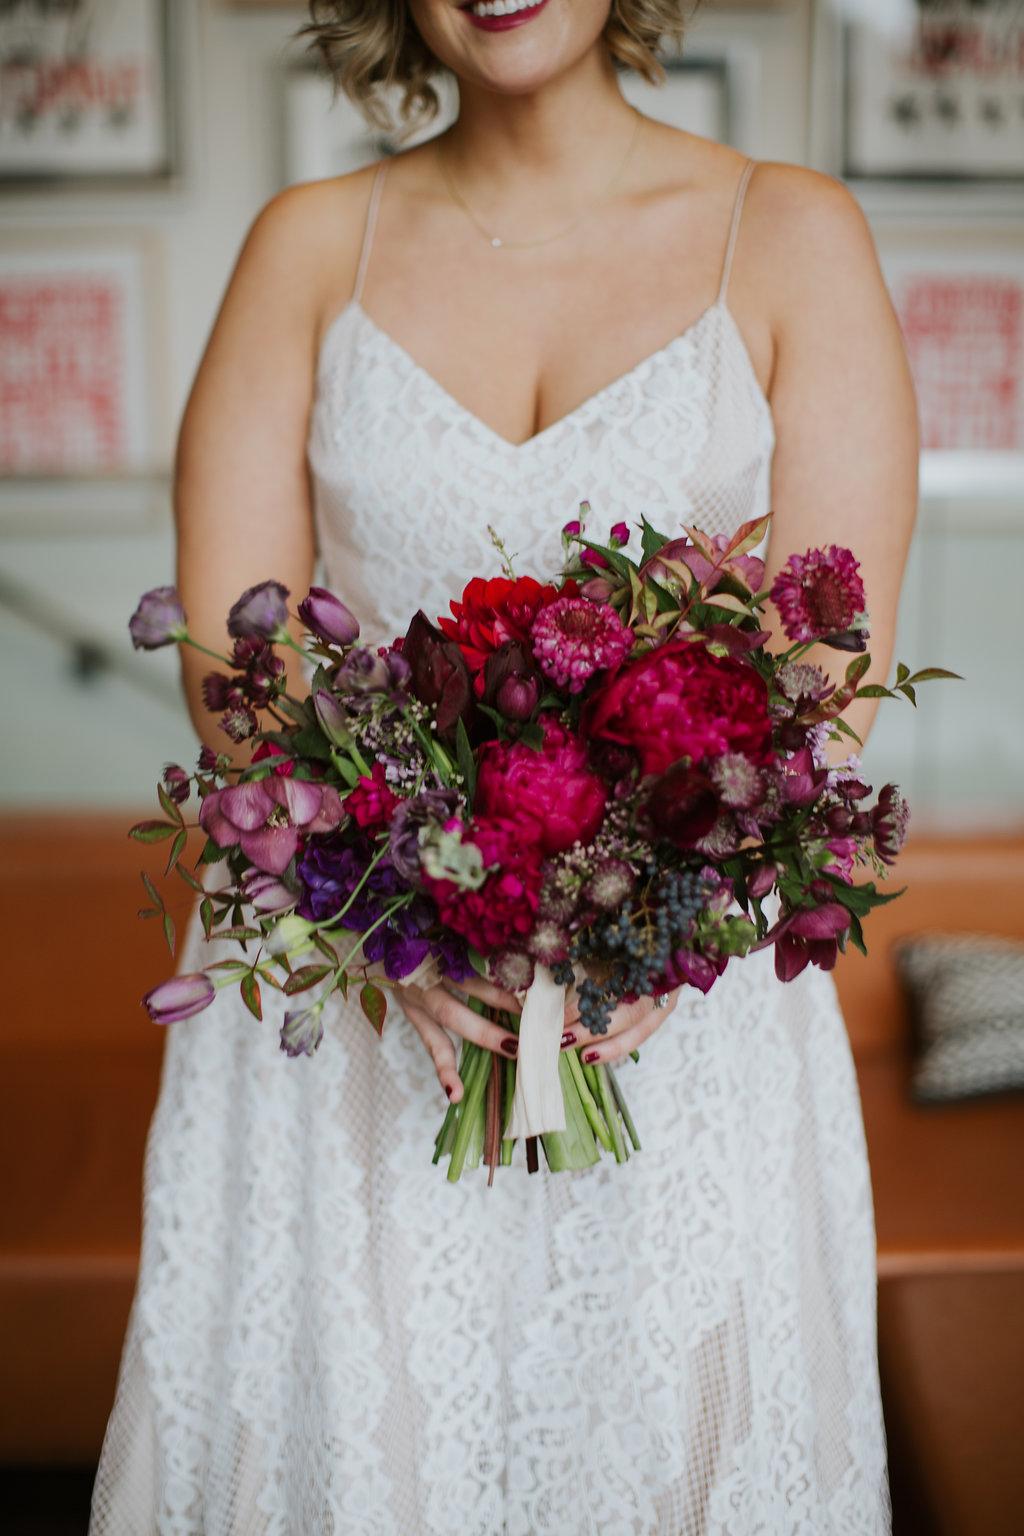 Paige-Newton-Intimate-Wedding-Photographer-Malverde-Wedding-Photography0018.jpg